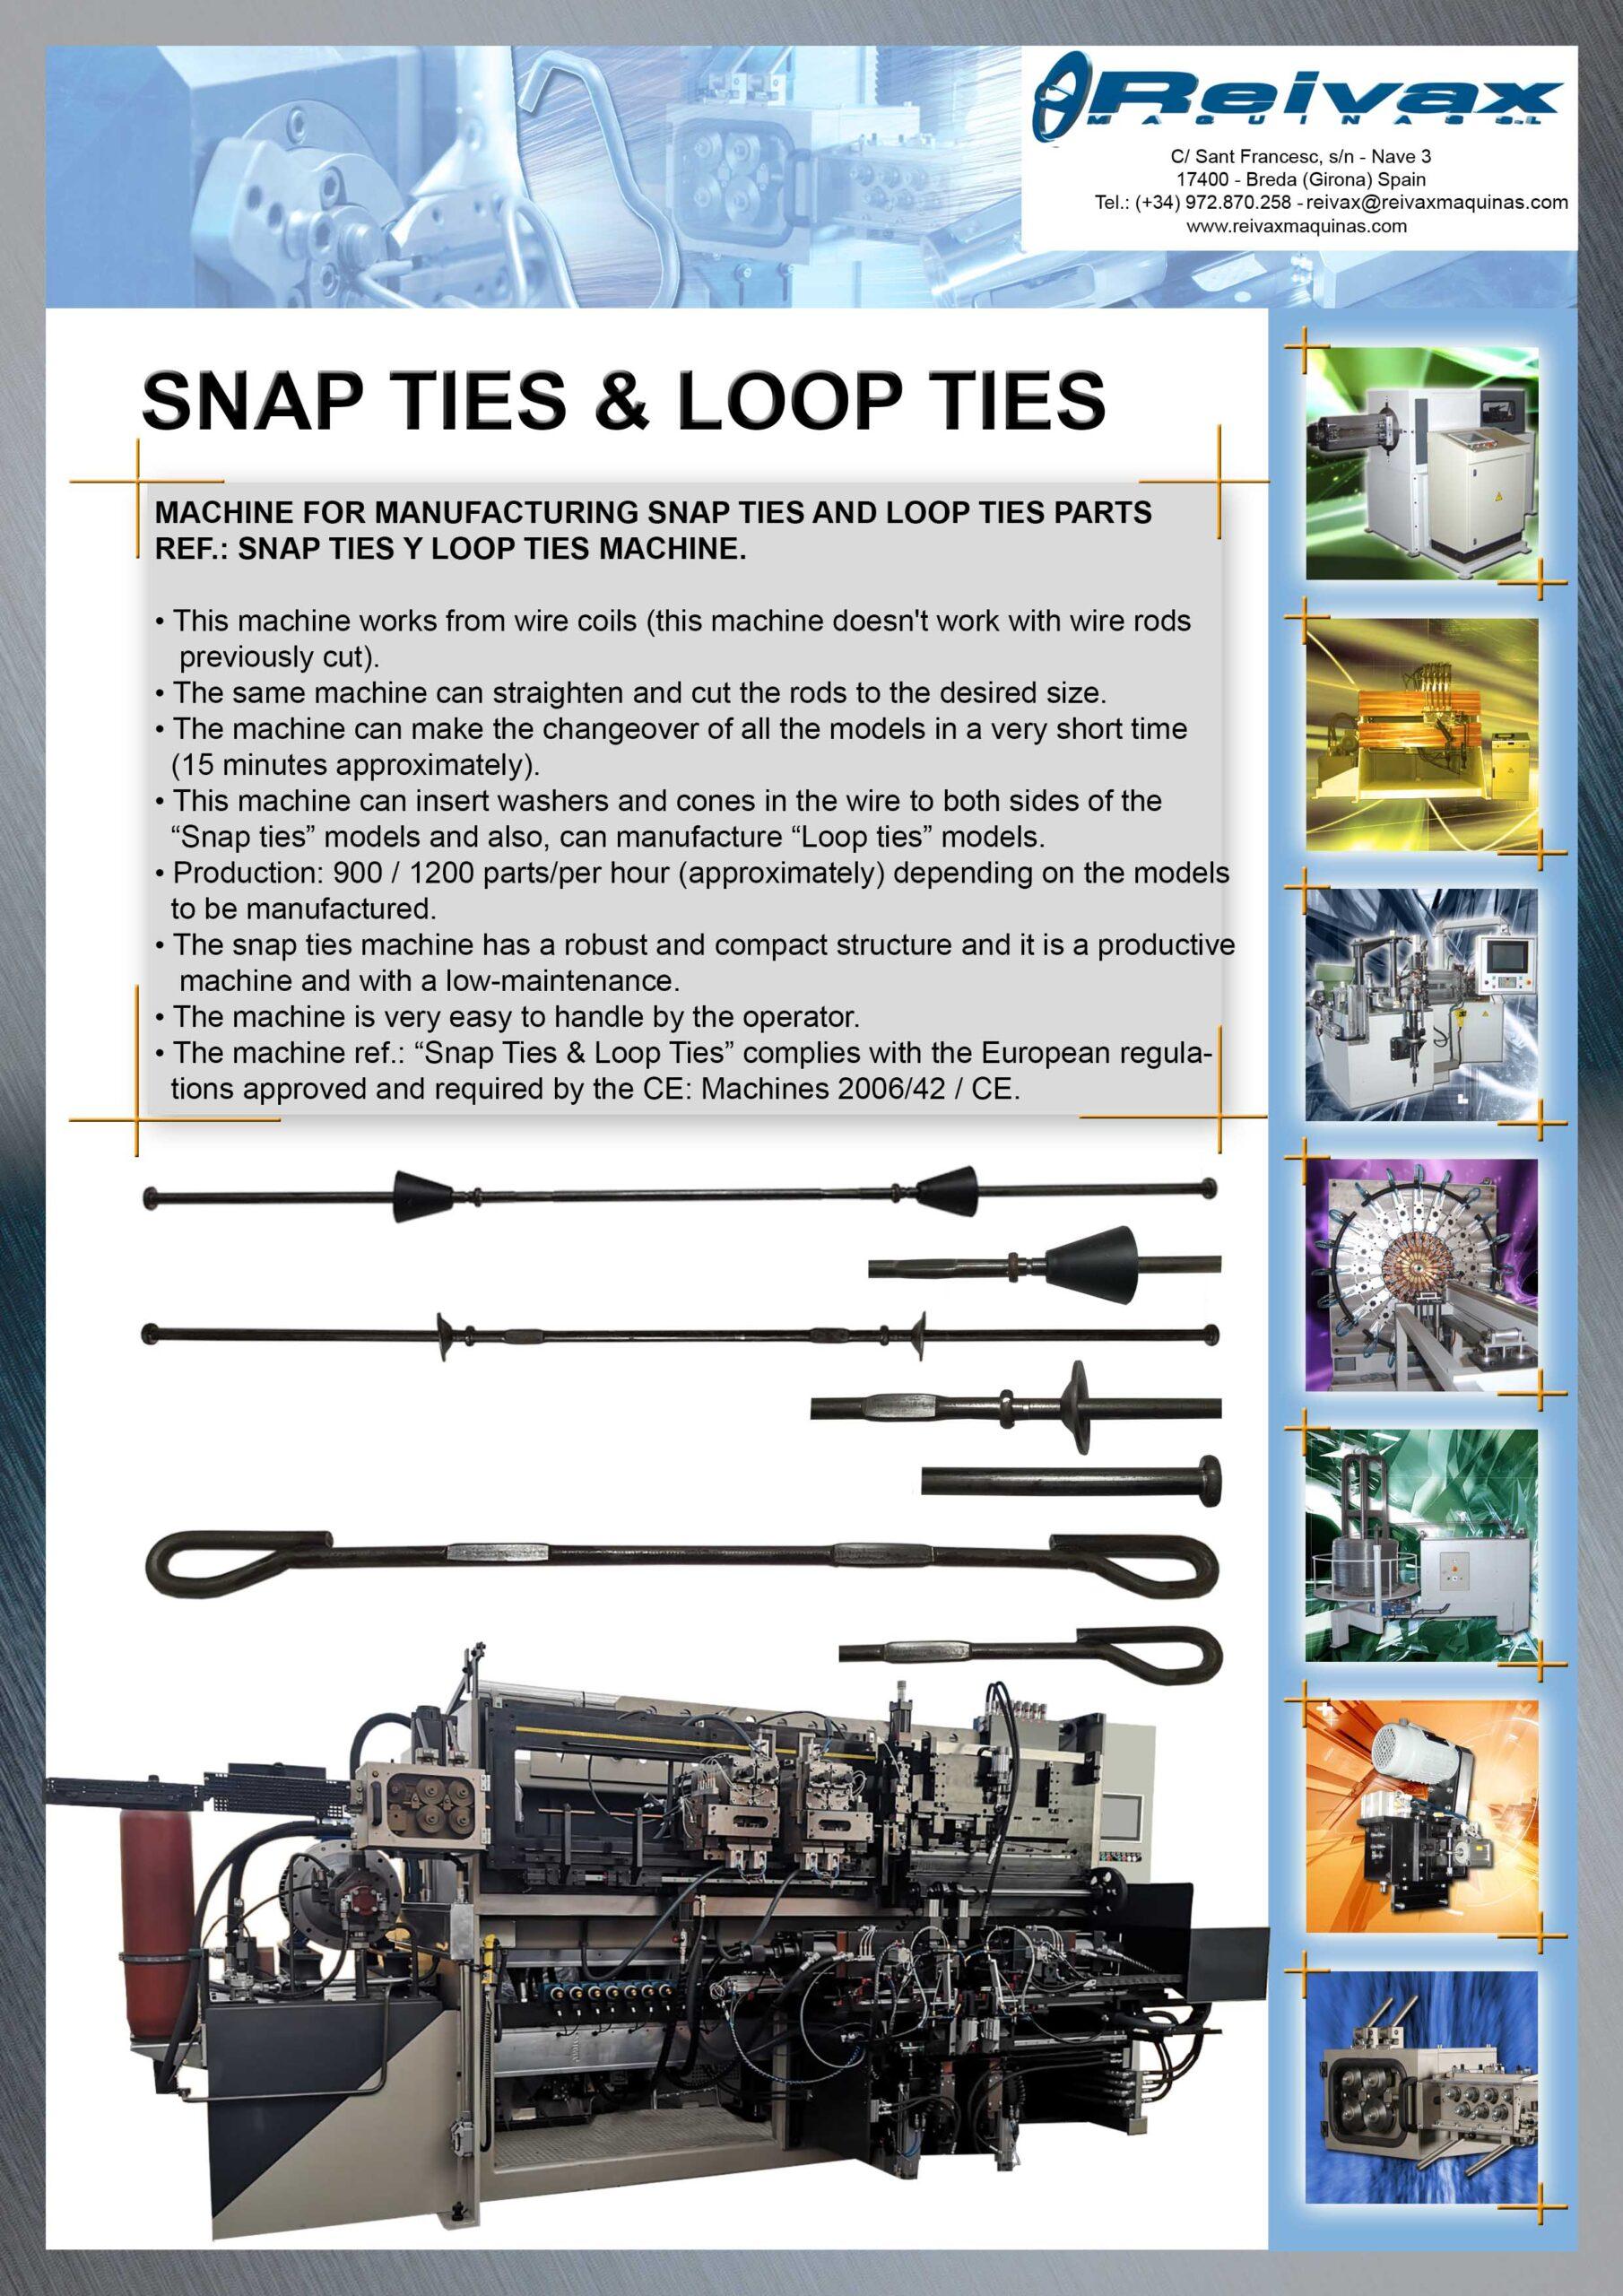 Reivax Maquinas, SL: Snap Ties and Loop Ties Machine Techical Data